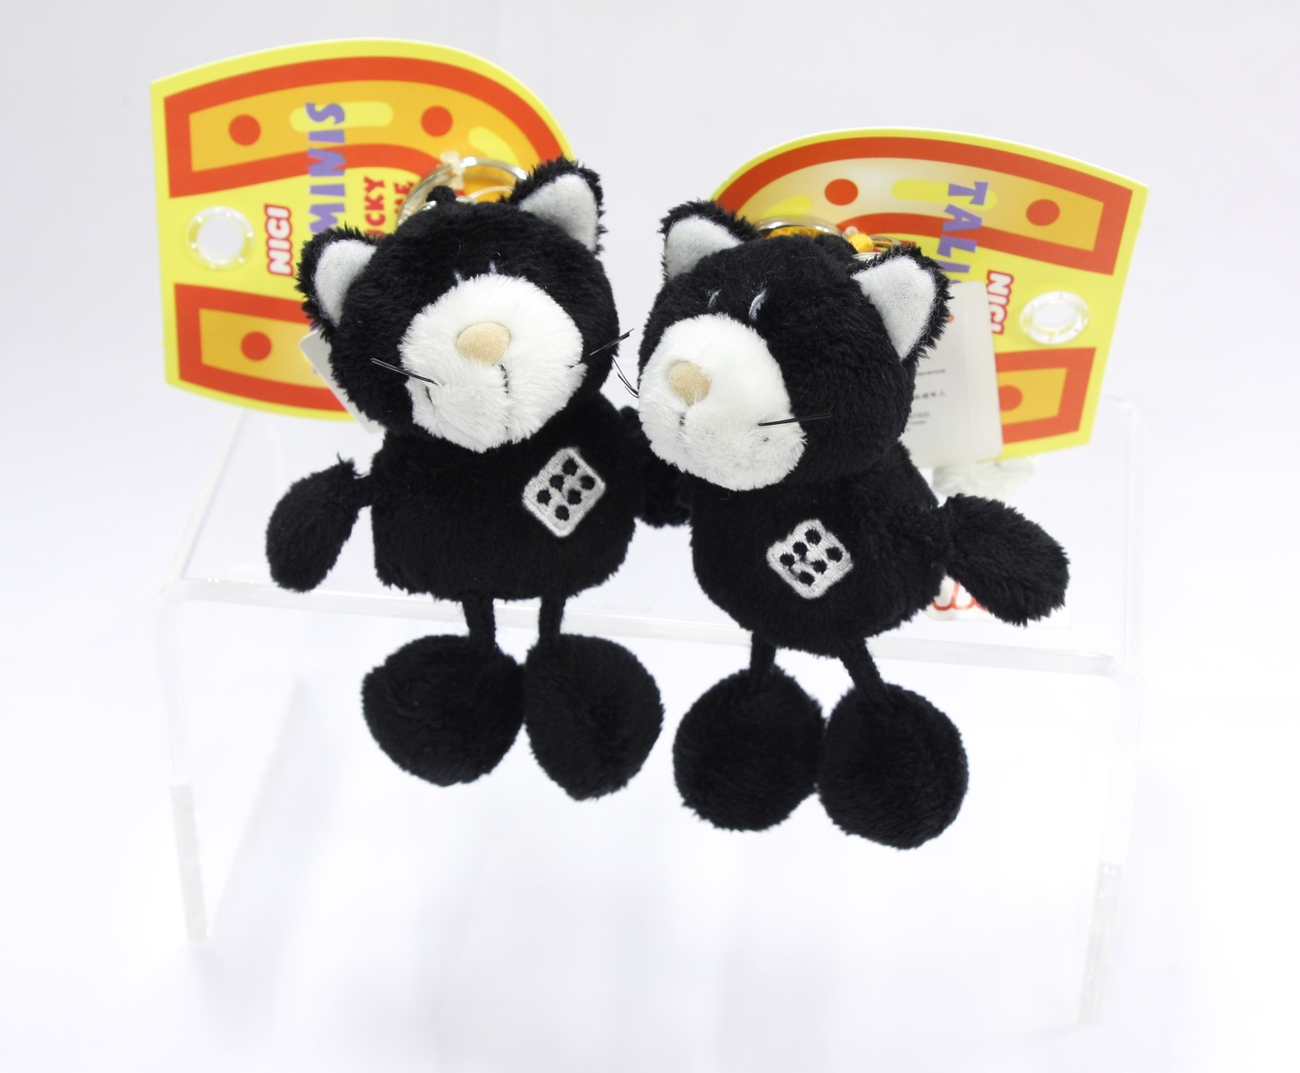 "NICI Cat Black Dice Animal Plush Stuffed Toys Bean Bag Key Chain Keyring 4"""